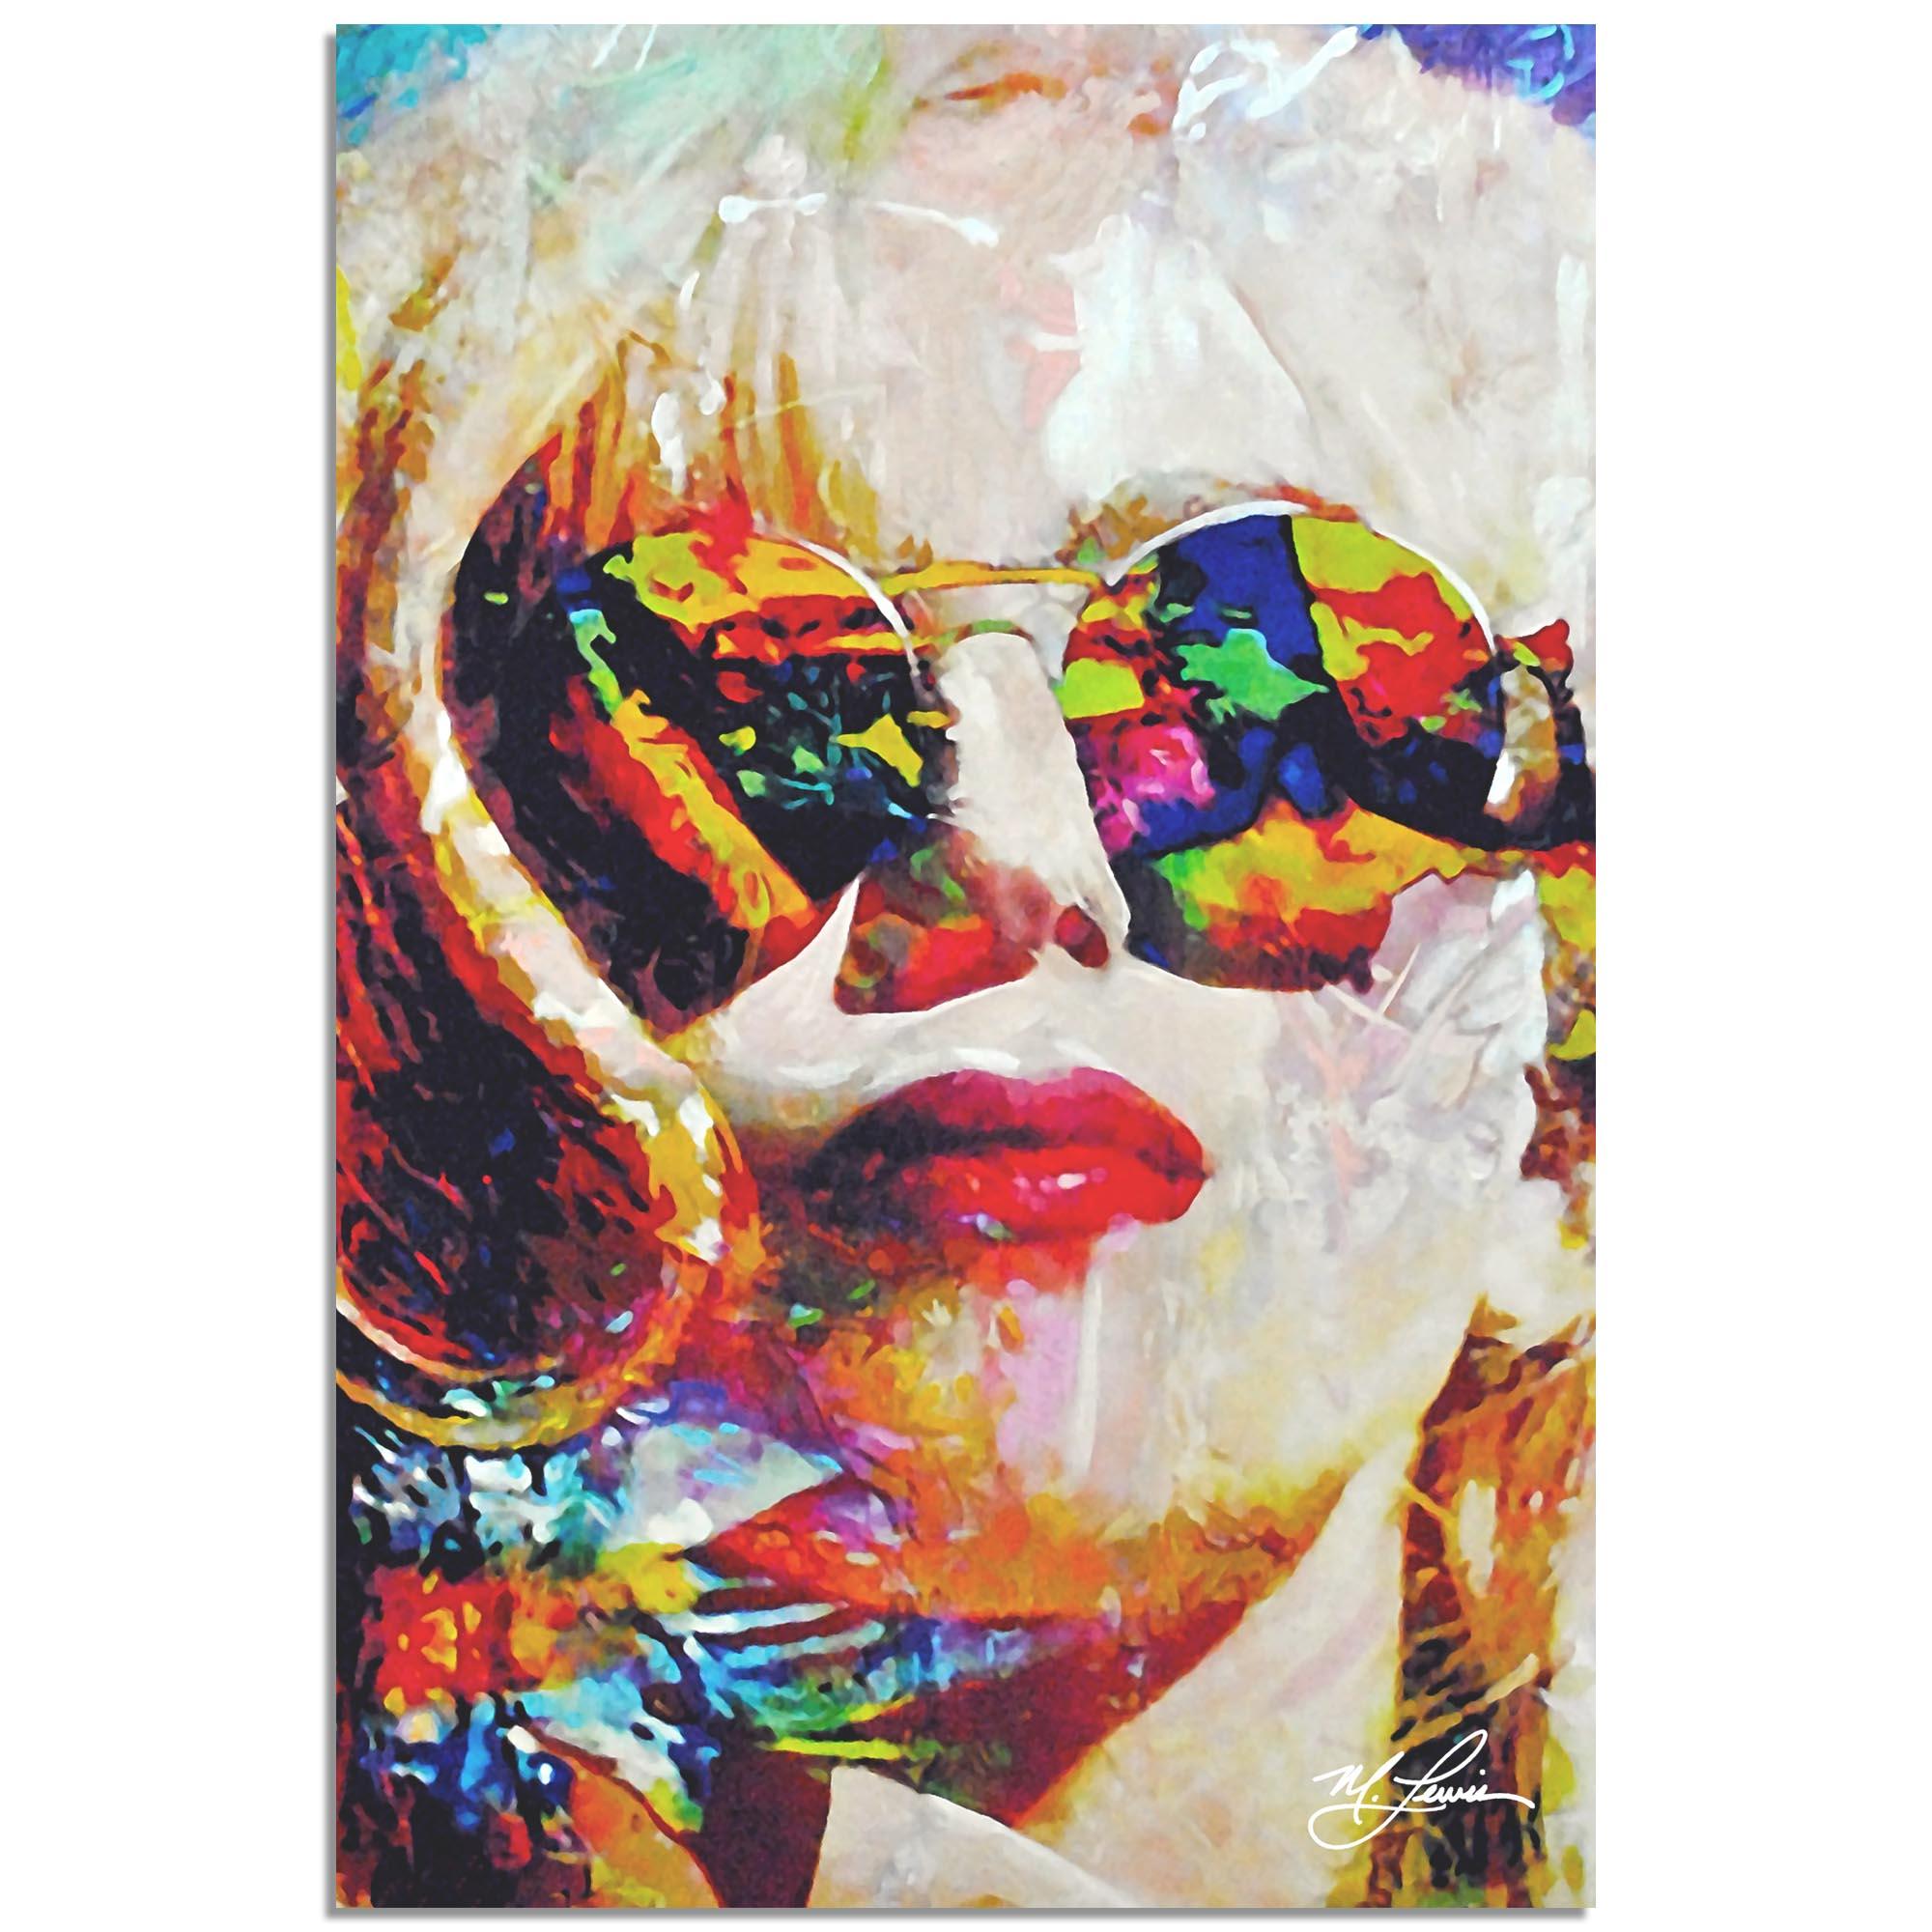 Mark Lewis 'Lady Gaga Study 2' 22in x 32in Celebrity Pop Art on Metal or Plexiglass